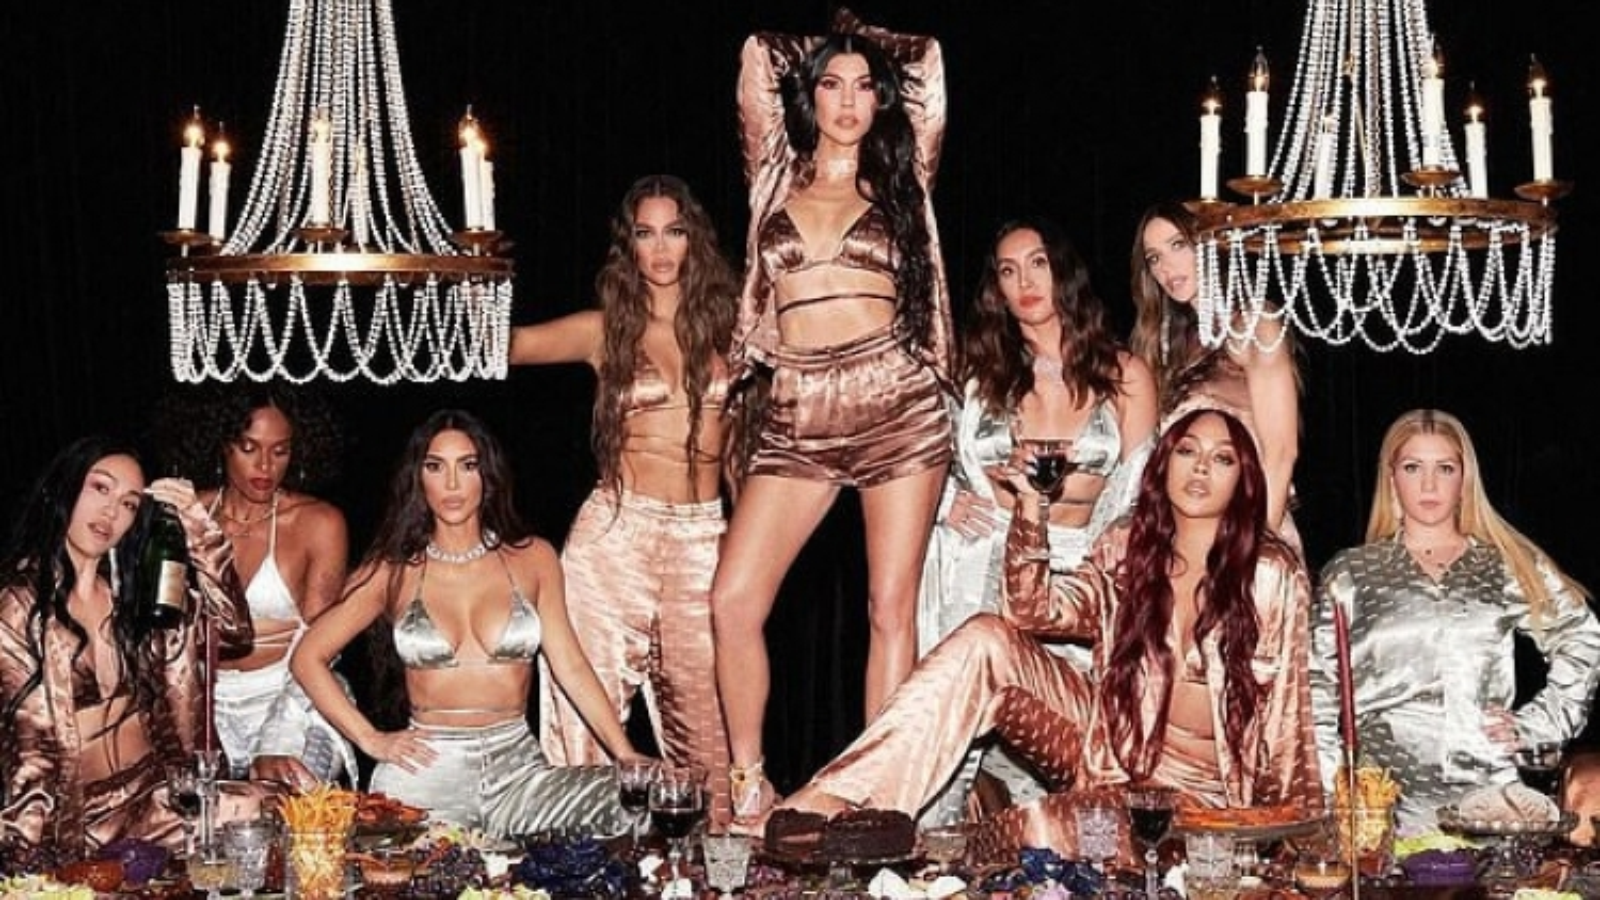 Kim Kardashian khoe vòng 1 bốc lửa với sản phẩm nội y mới